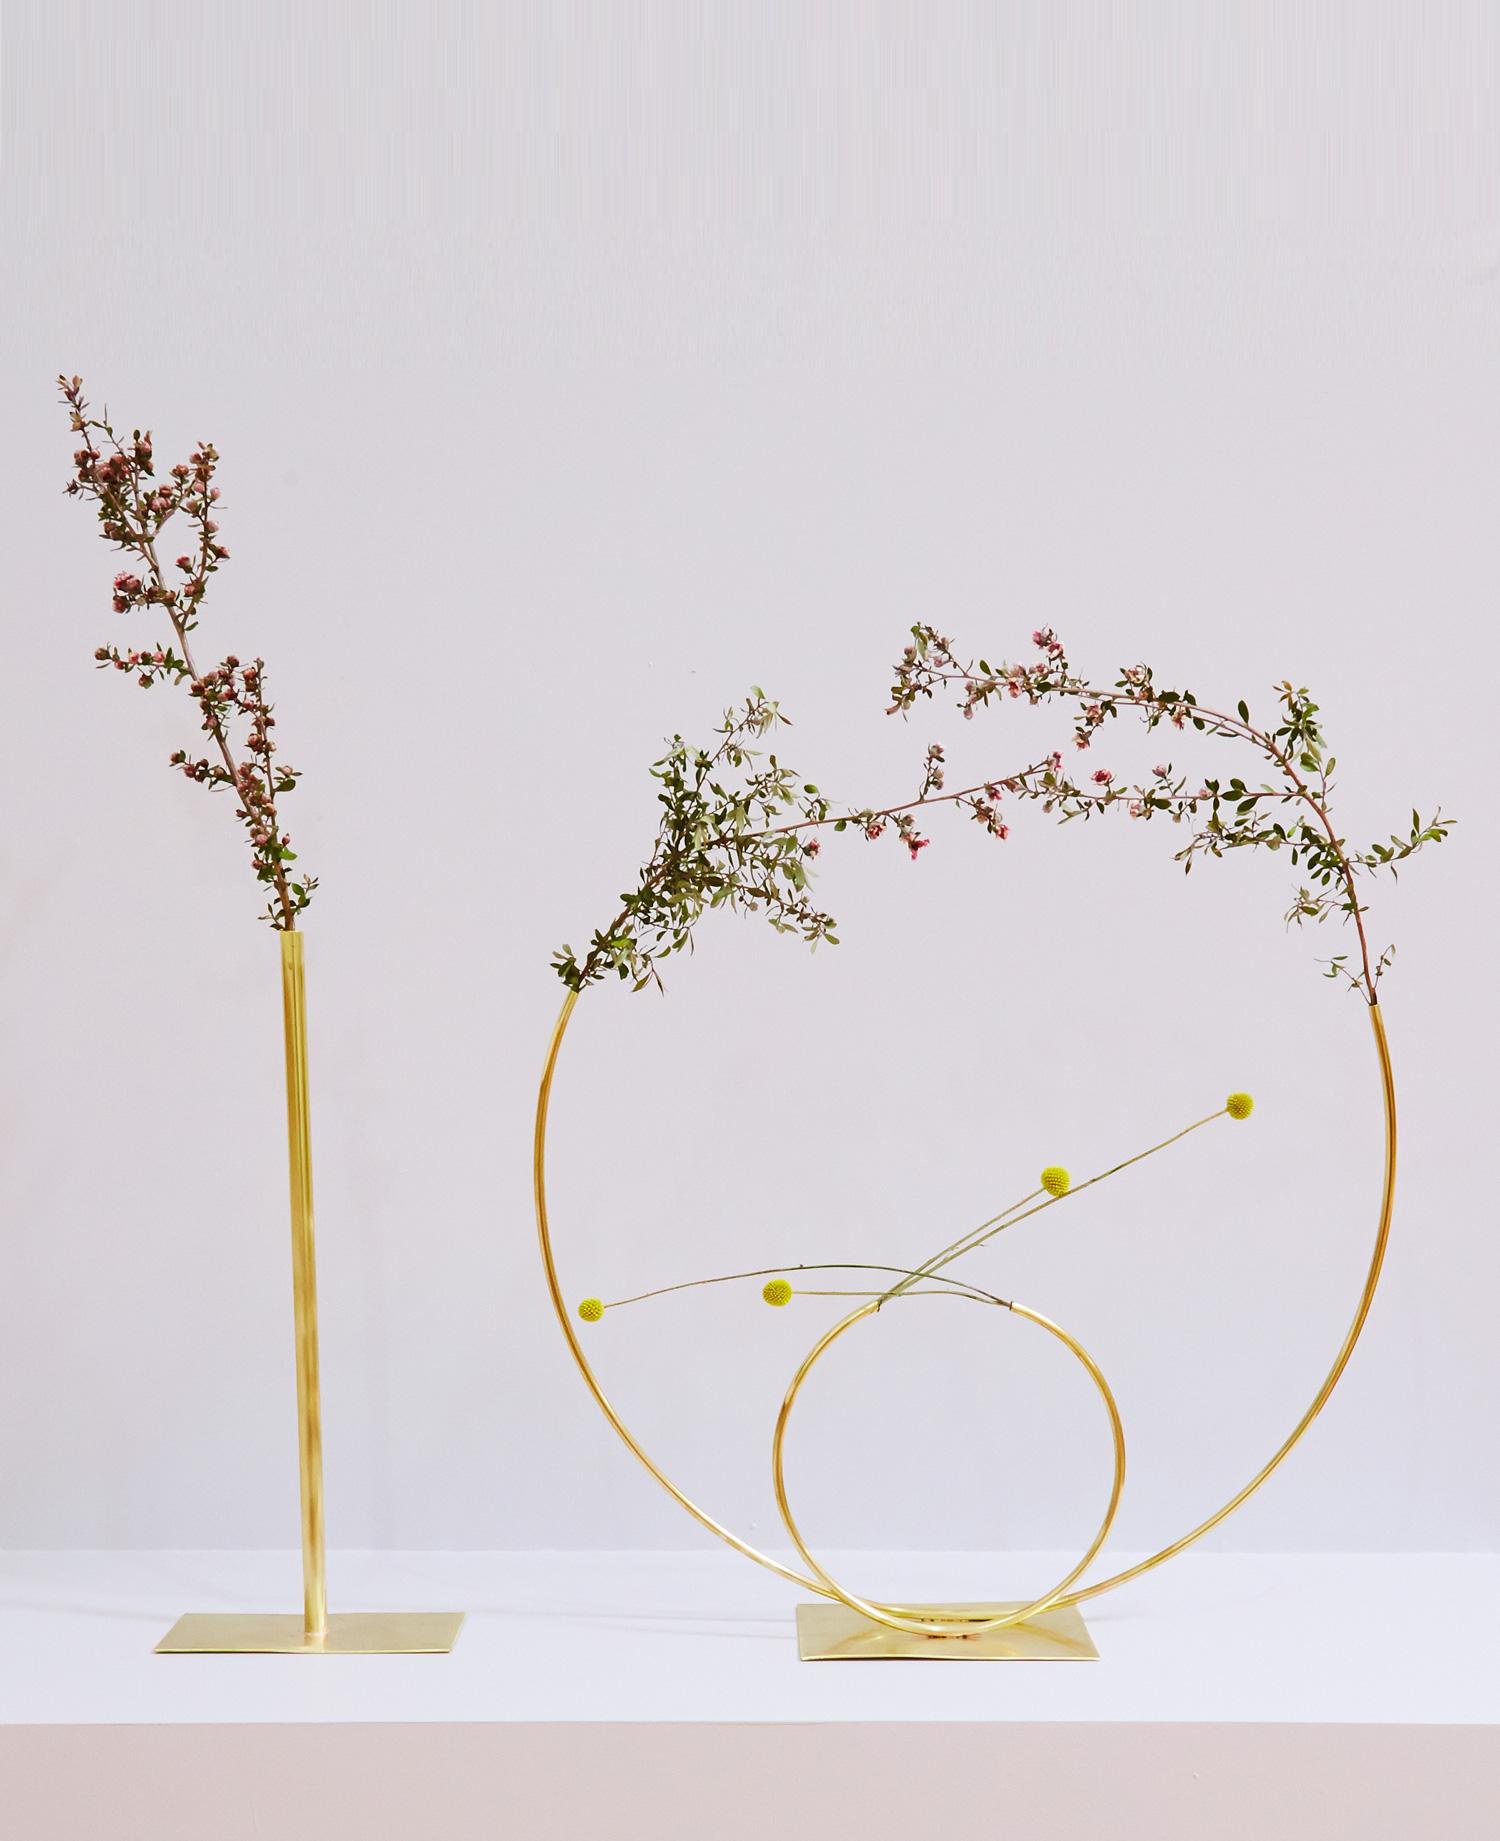 Local Design Anna Varendorff for A.C.V Studio, Australian Designers Milan | Yellowtrace